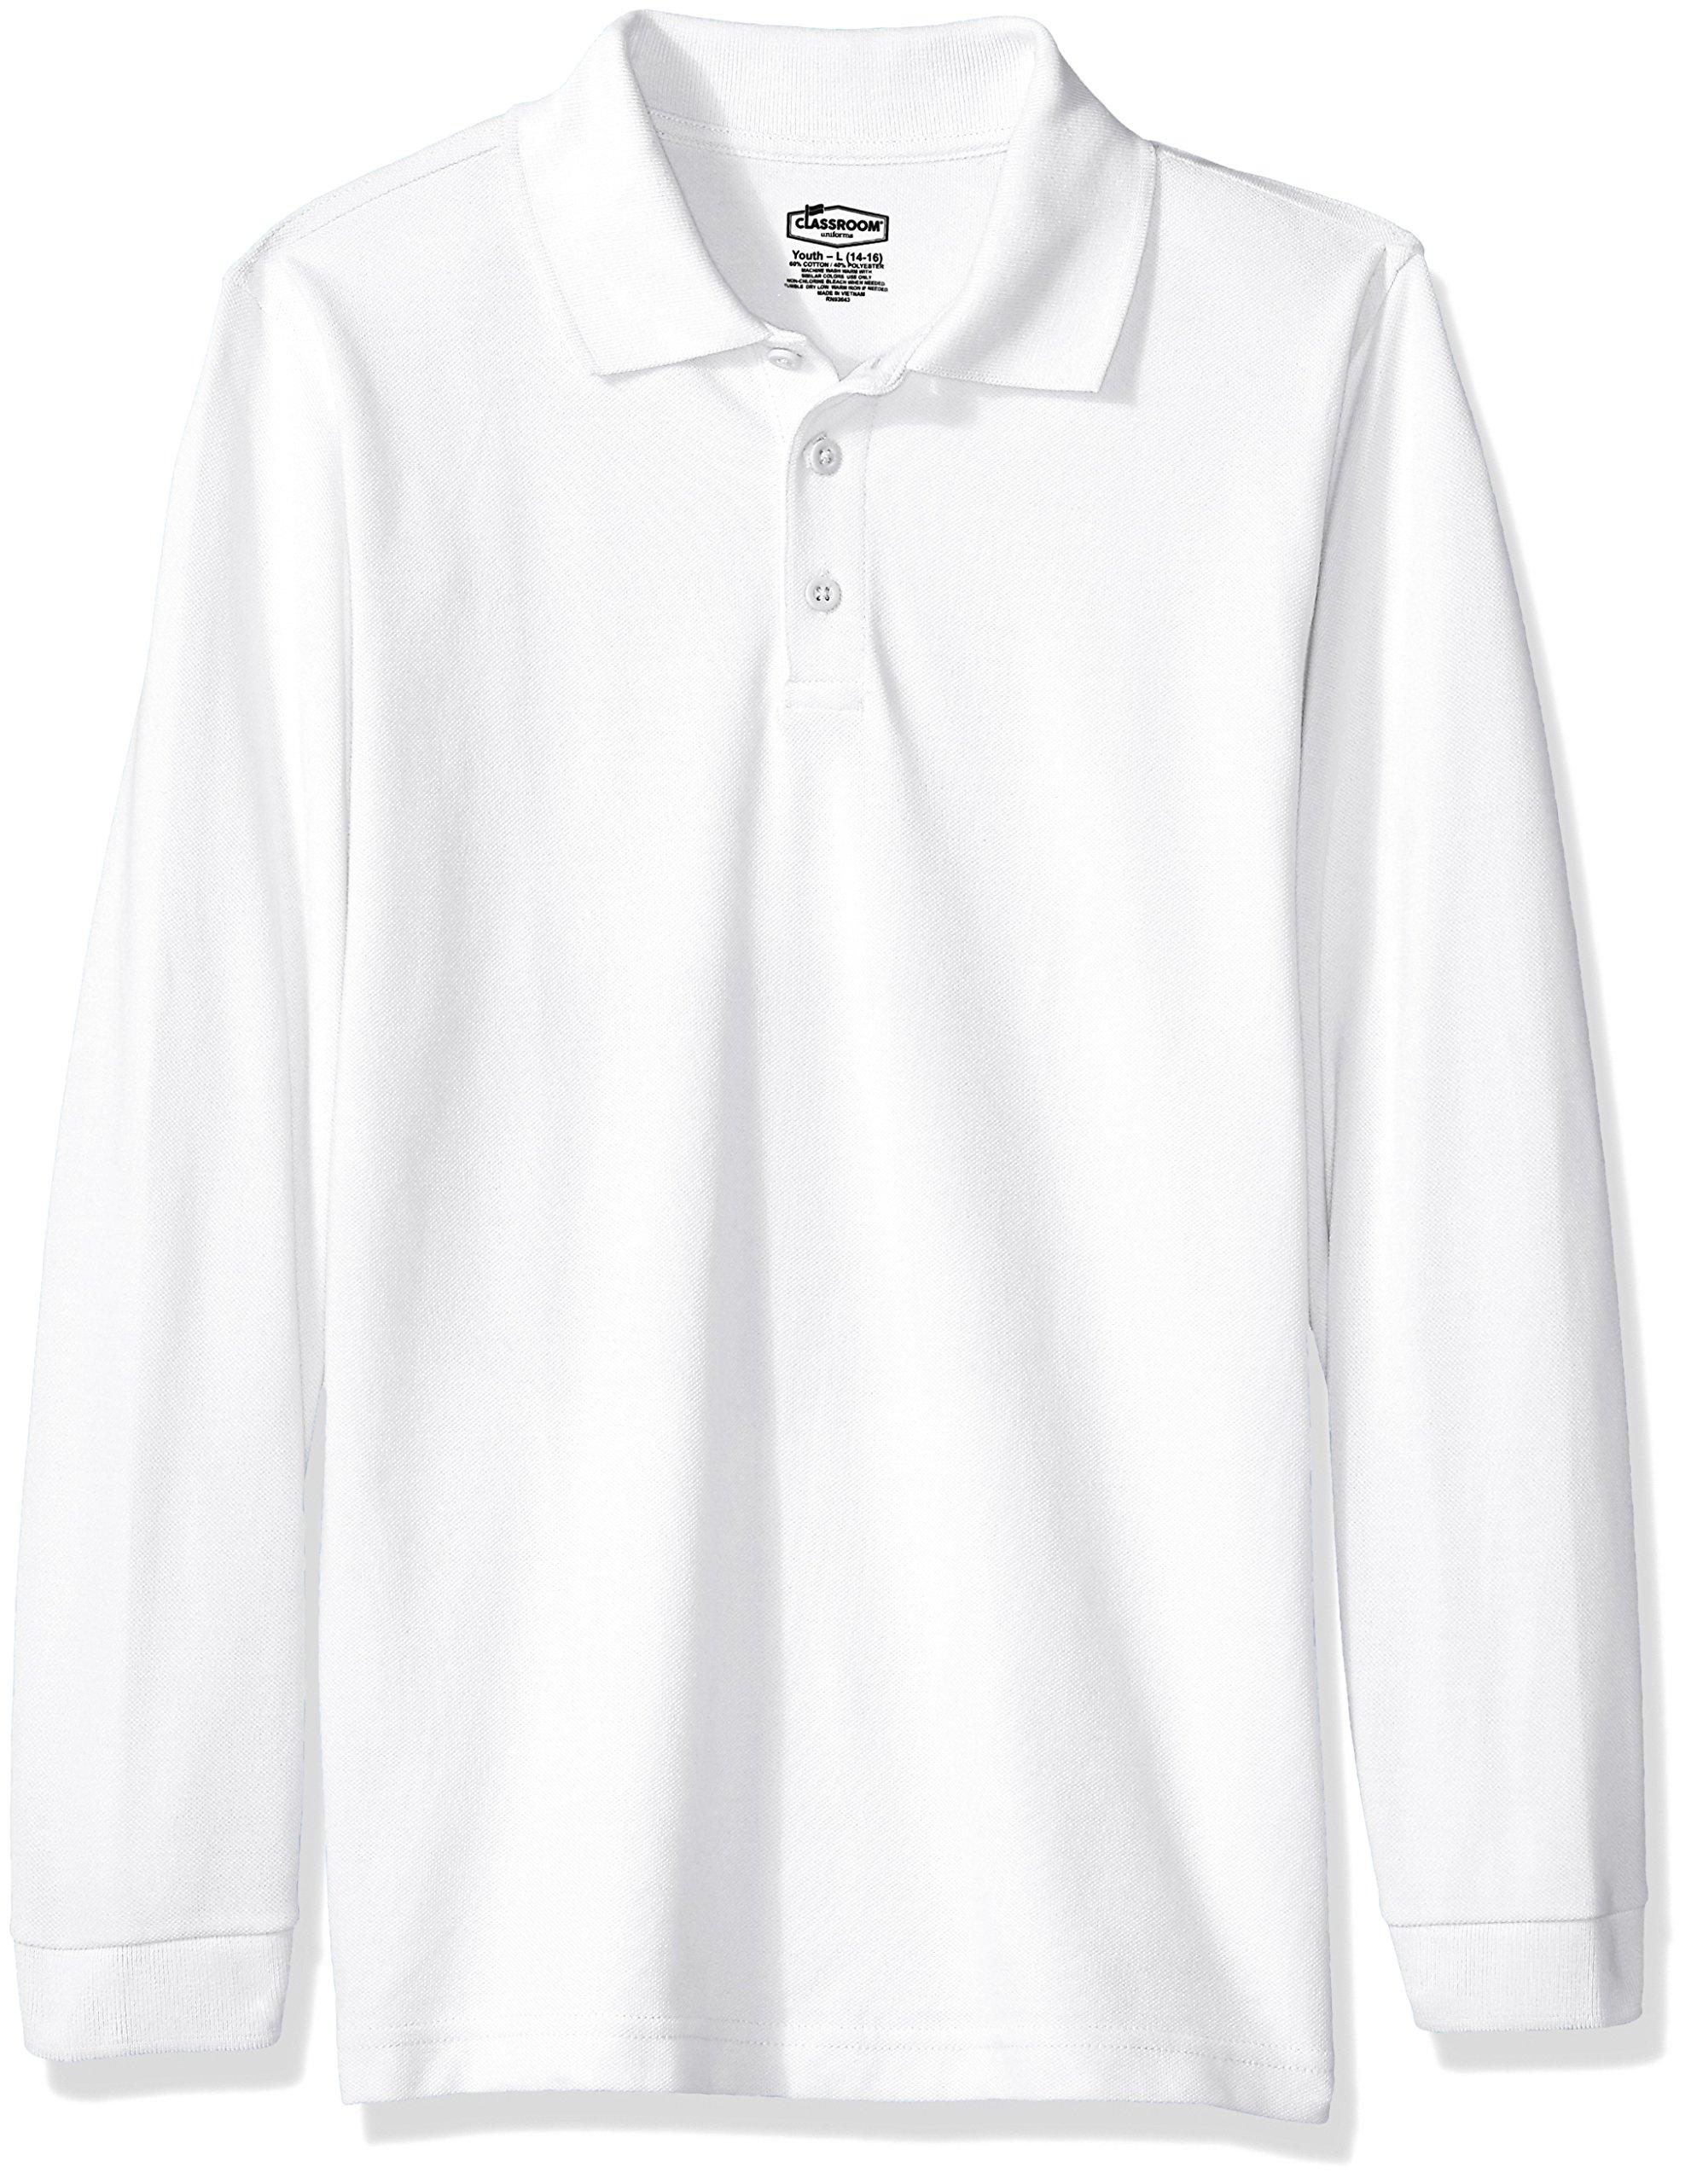 Classroom Big Kids Boys' Uniform Long Sleeve Pique Polo, Sos White, L